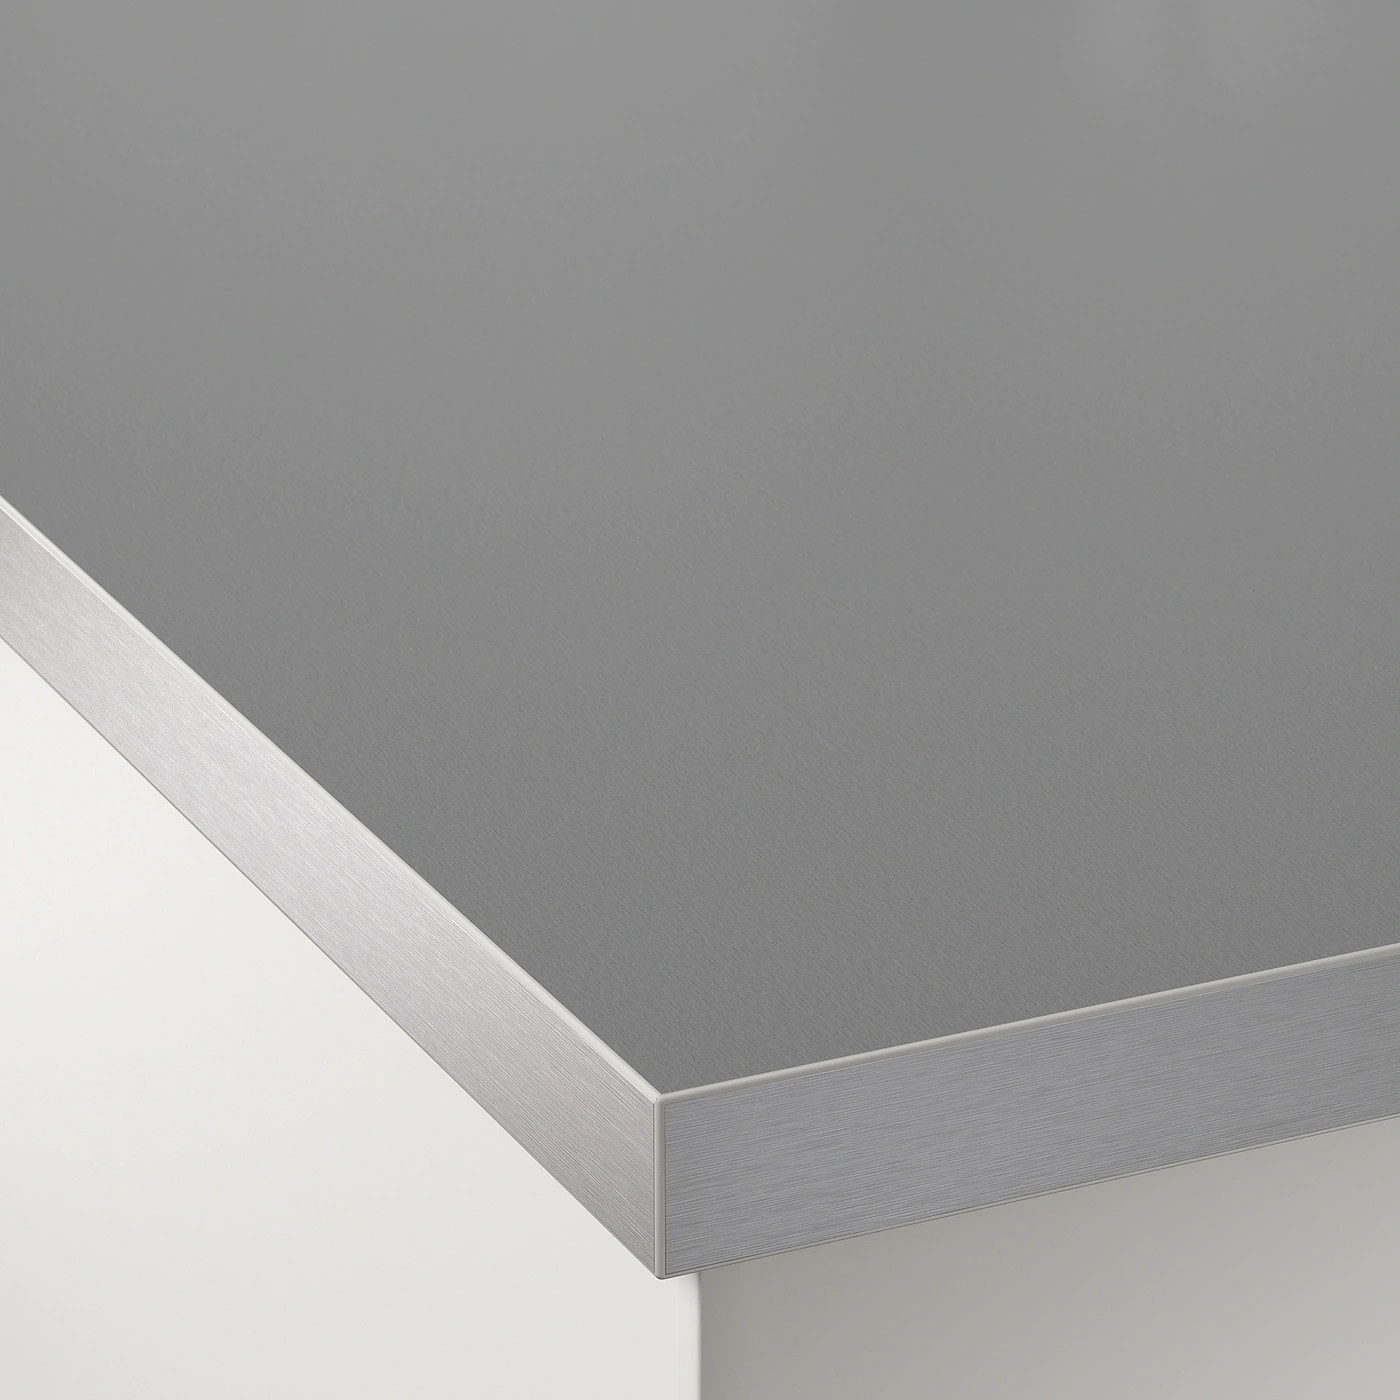 Hallestad Plan De Travail Double Face Blanc Motif Aluminium Chant Effet Metal Motif Aluminium Av Chant Effet Metal Stratifie 186x3 Ikea